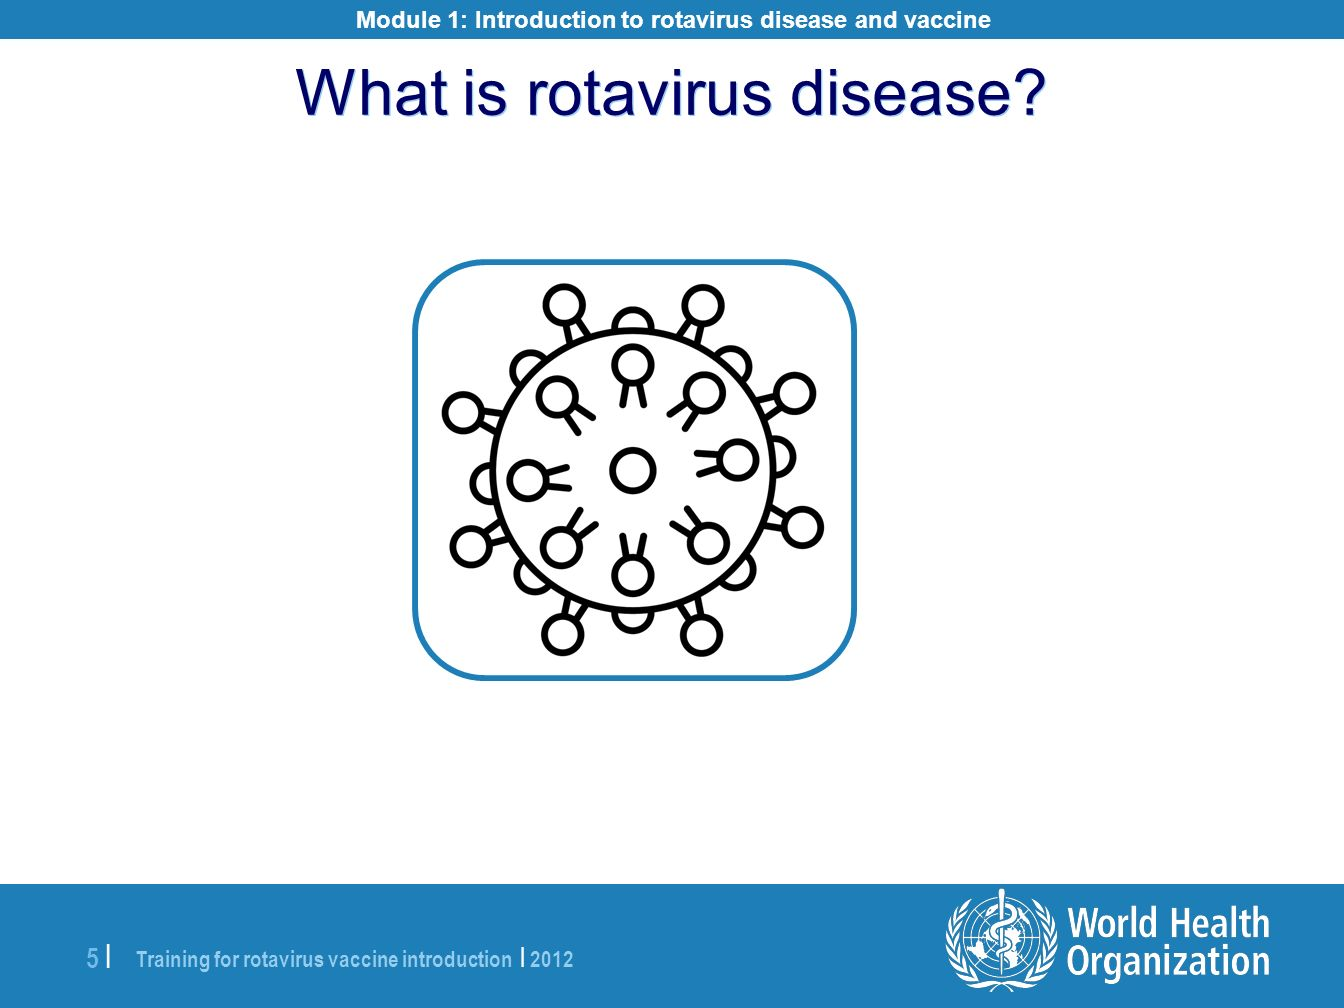 Training for rotavirus vaccine introduction | 2012 5 |5 | What is rotavirus disease? Module 1: Introduction to rotavirus disease and vaccine